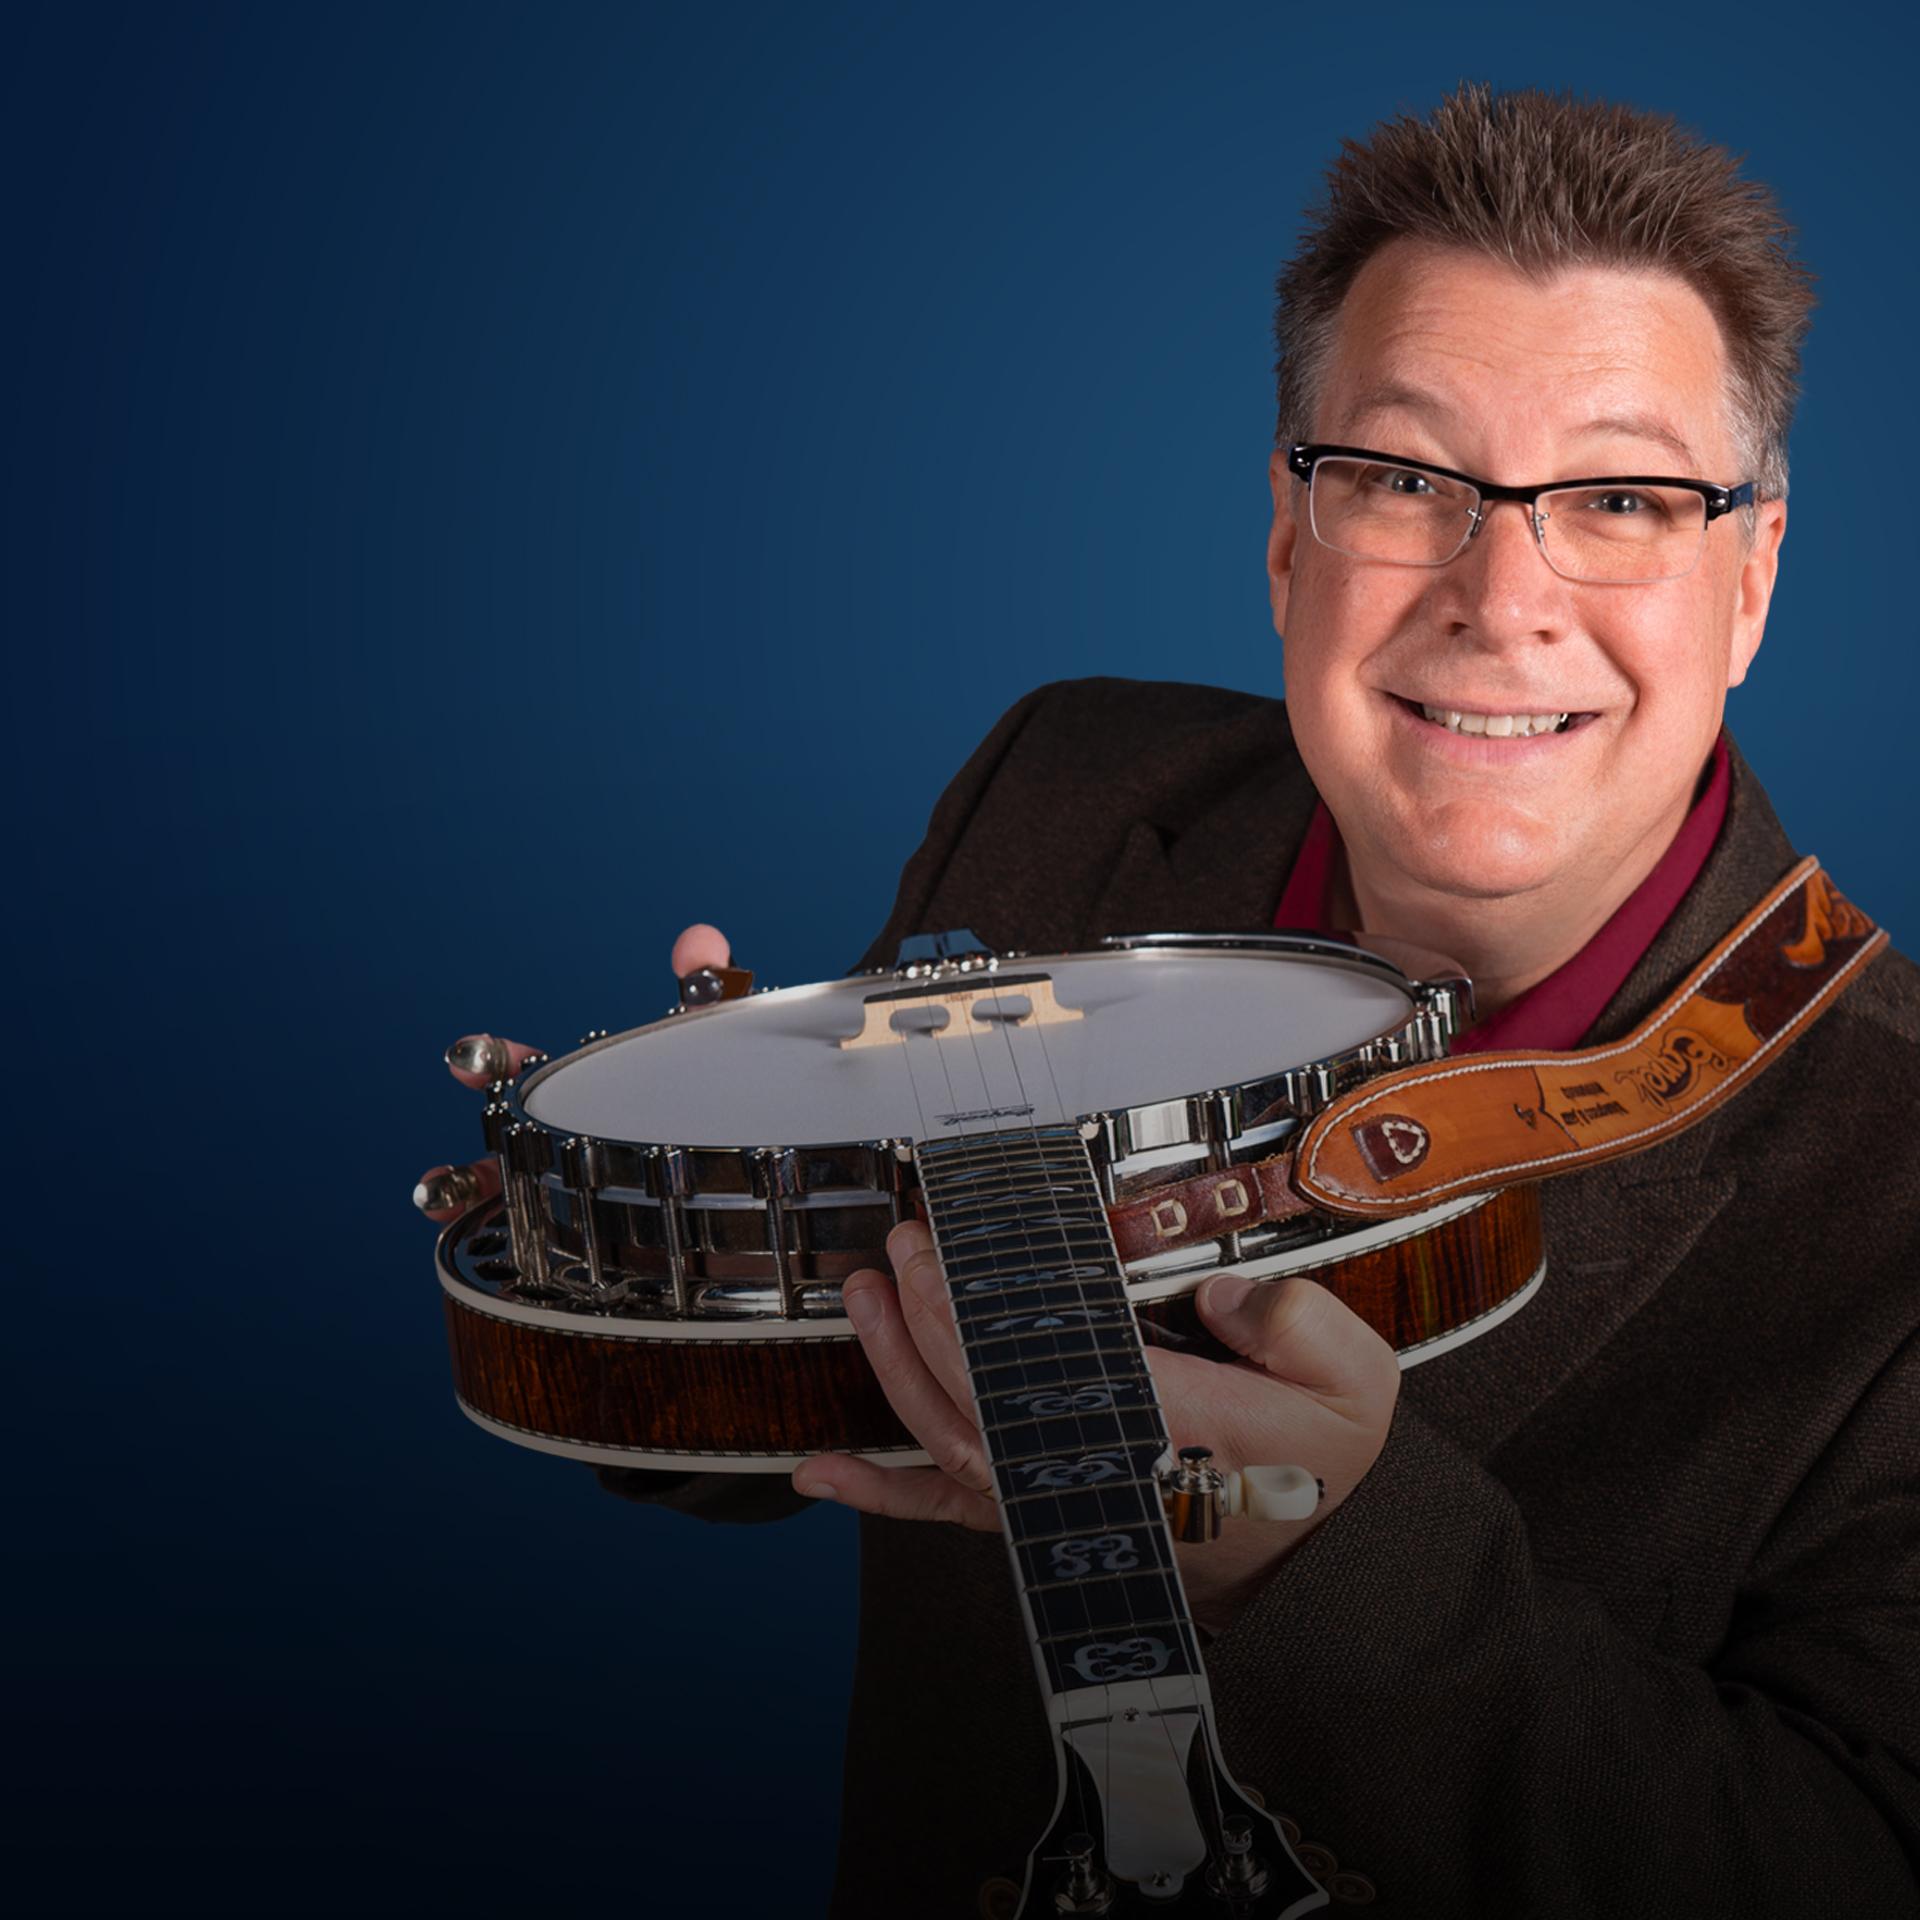 More Banjo Sunday with Ned Luberecki